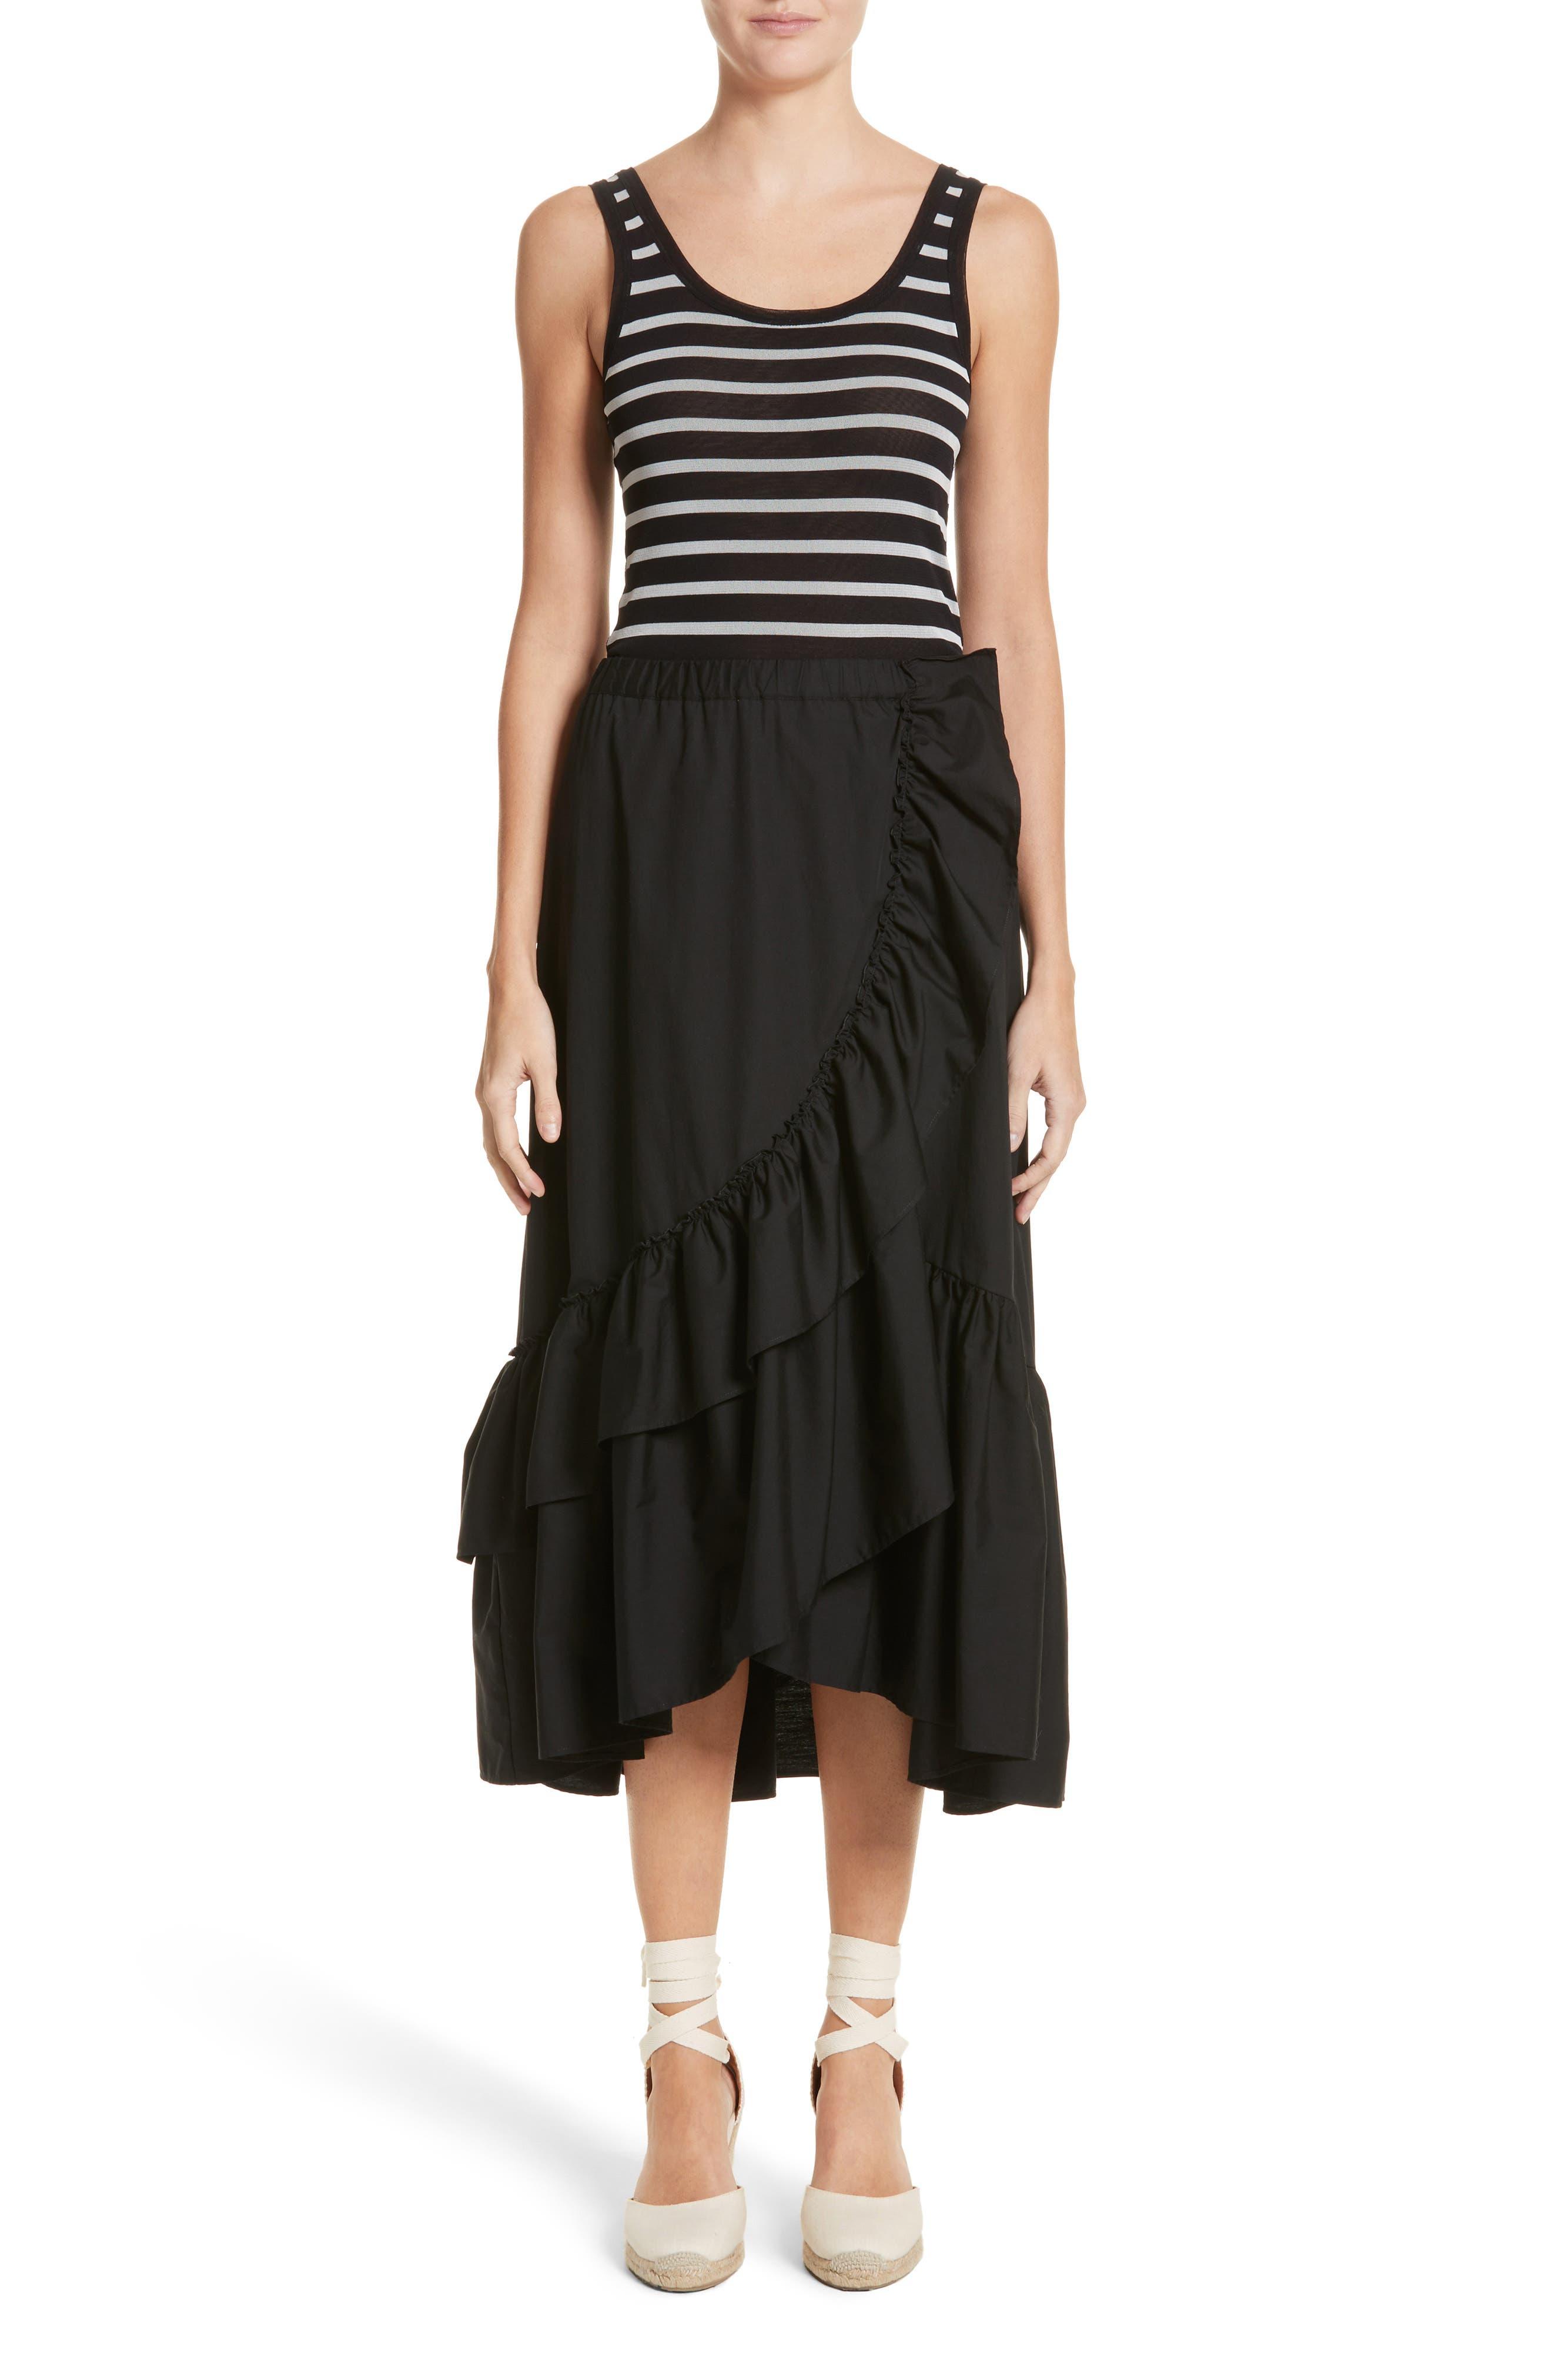 FUZZI,                             Ruffled Poplin Skirt,                             Alternate thumbnail 7, color,                             001